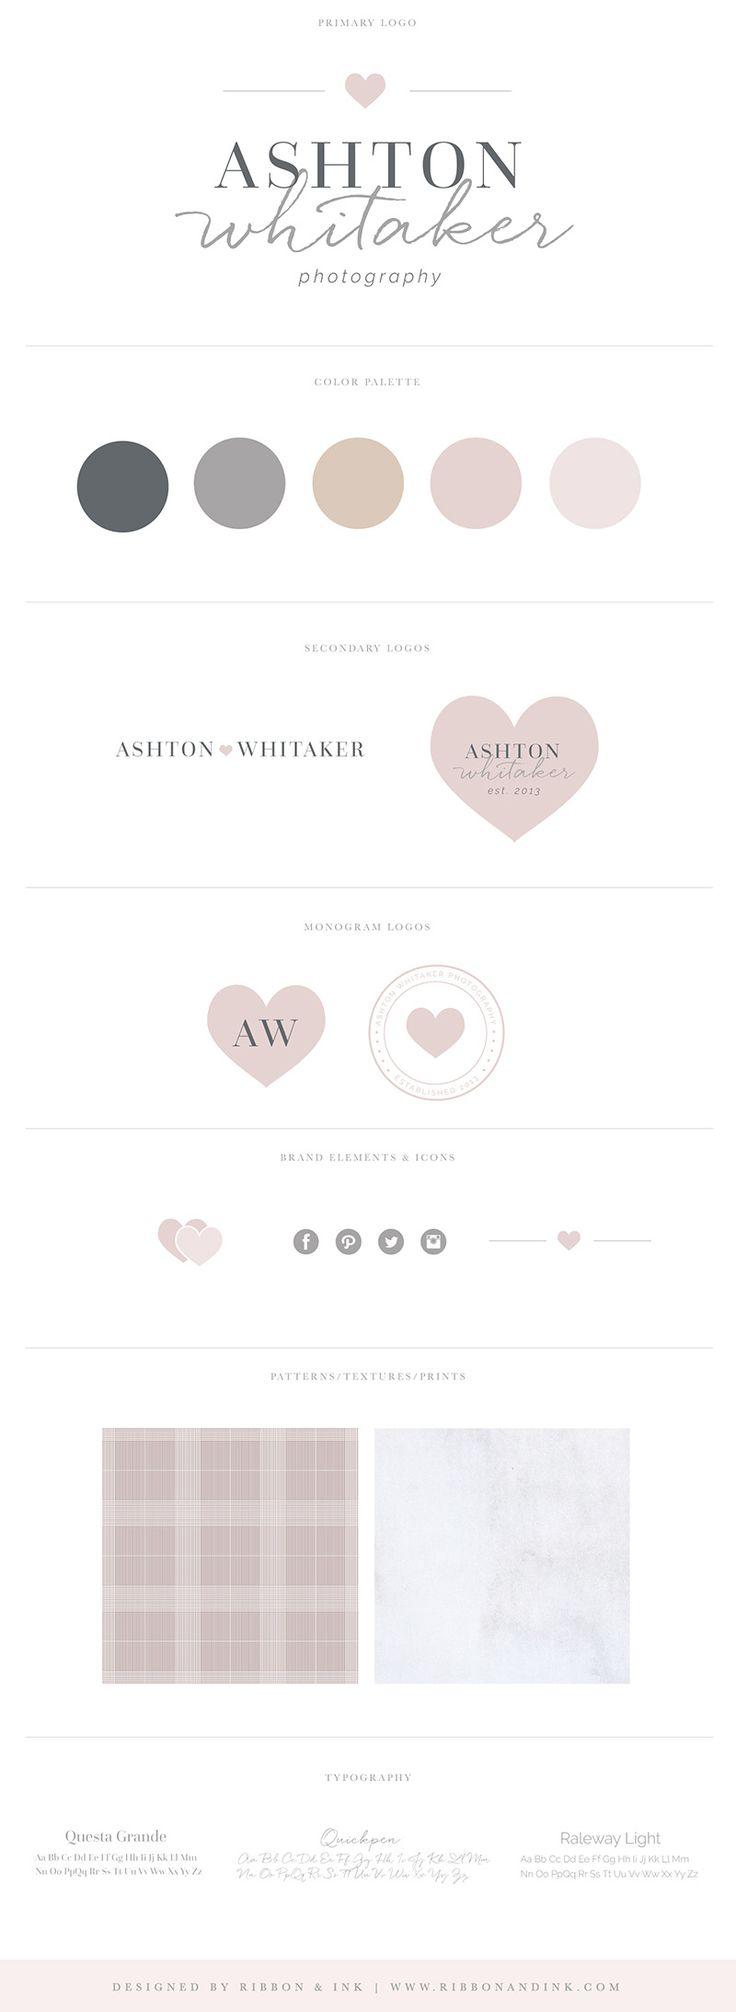 Premade branding / semi custom logo / premade logo / branding for photographers / logo design / semi custom logo / brand kit / brand board / brand ideas / color palette / brand board / pink / marble / grey